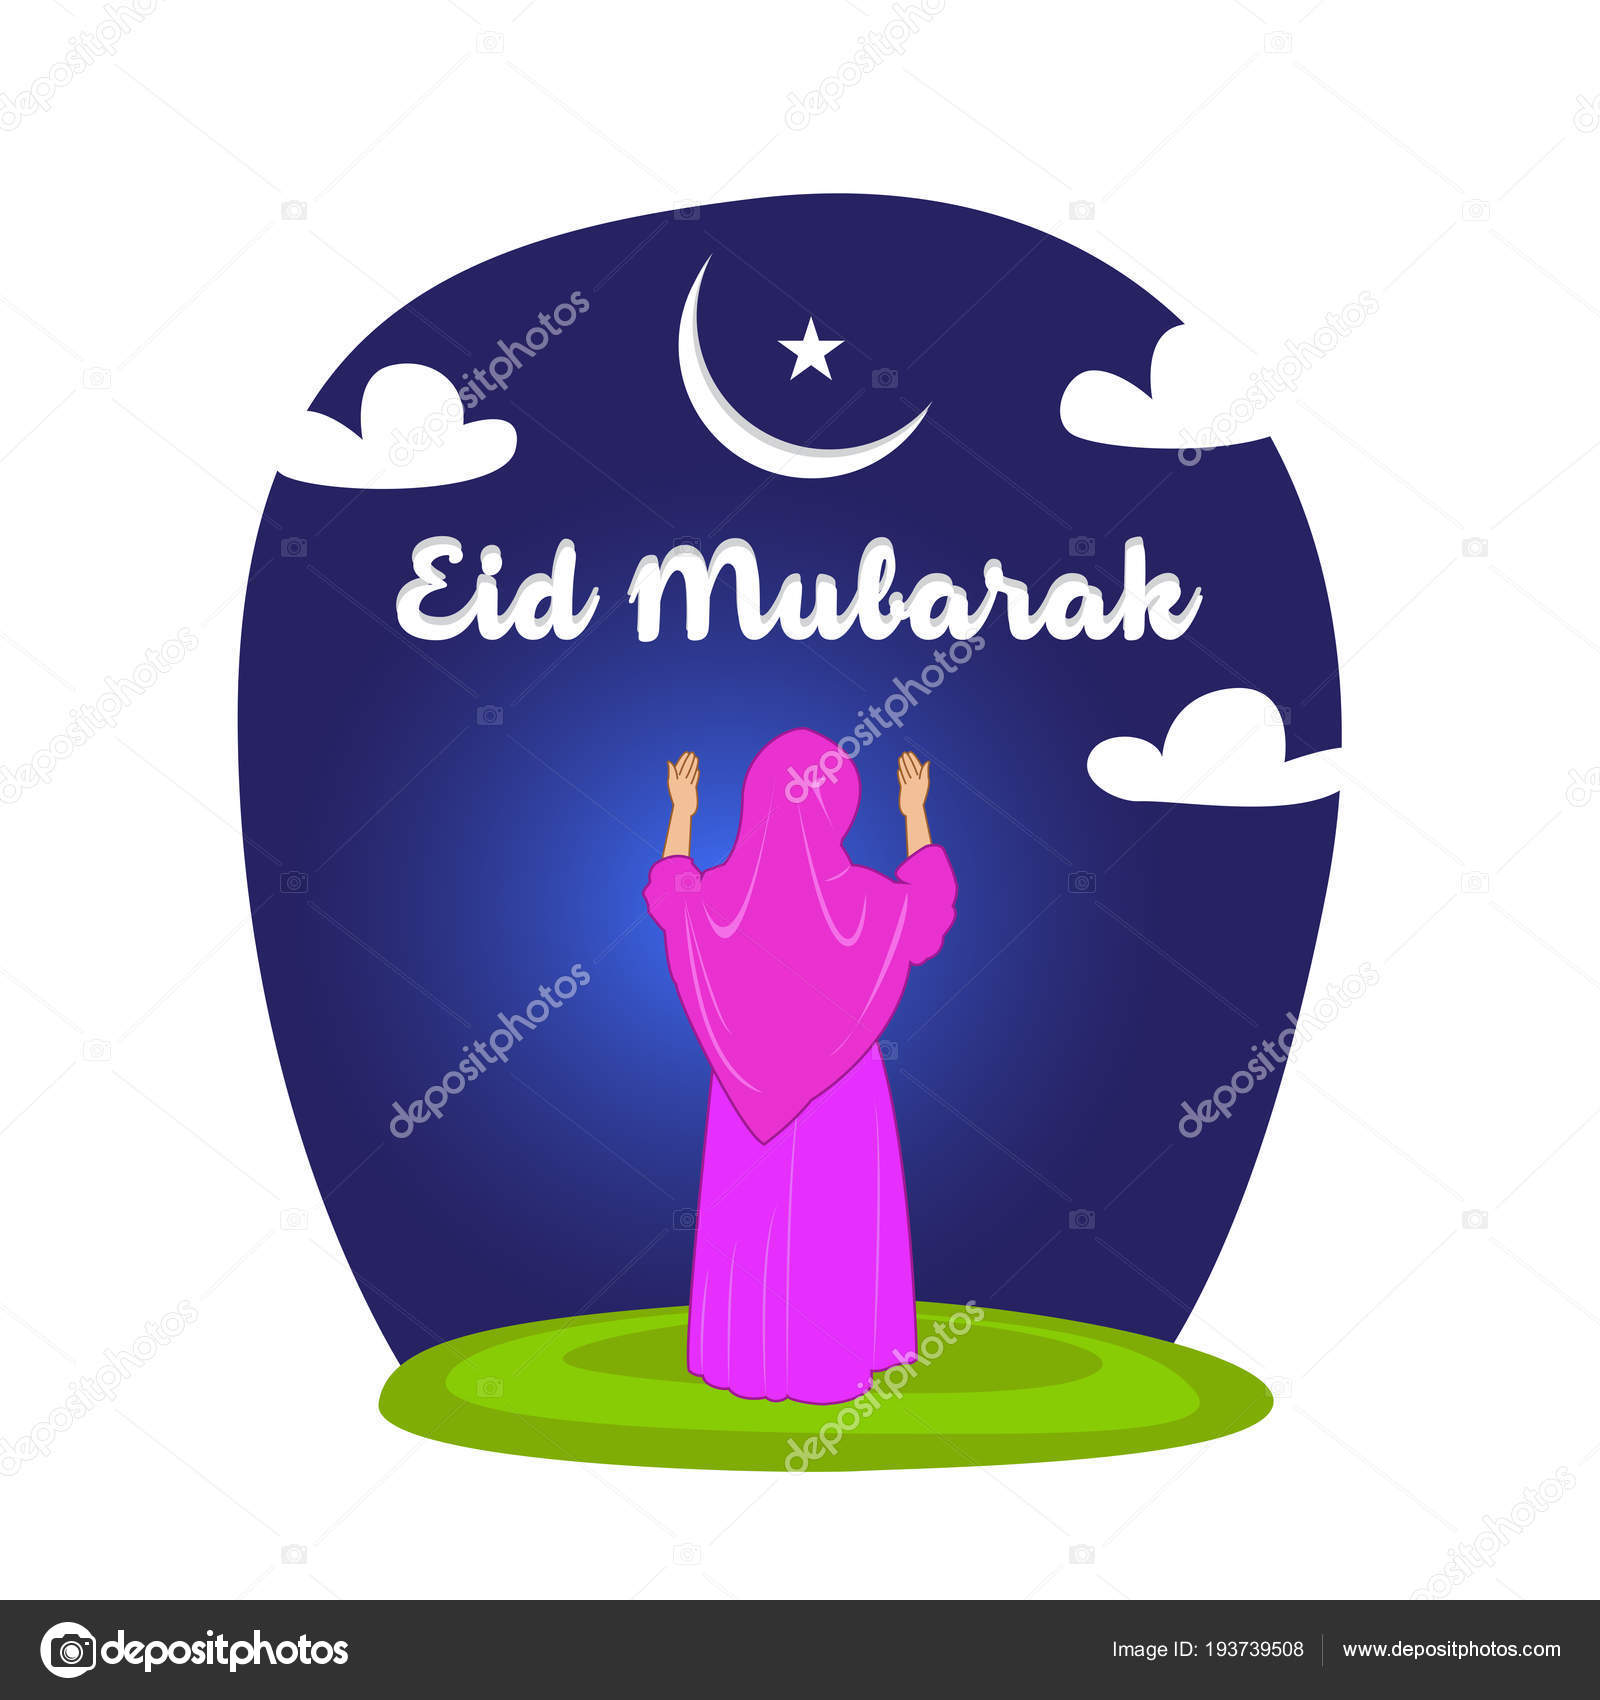 Poster Eid Mubarak Praying Woman Raising Hands Looking Moon Star